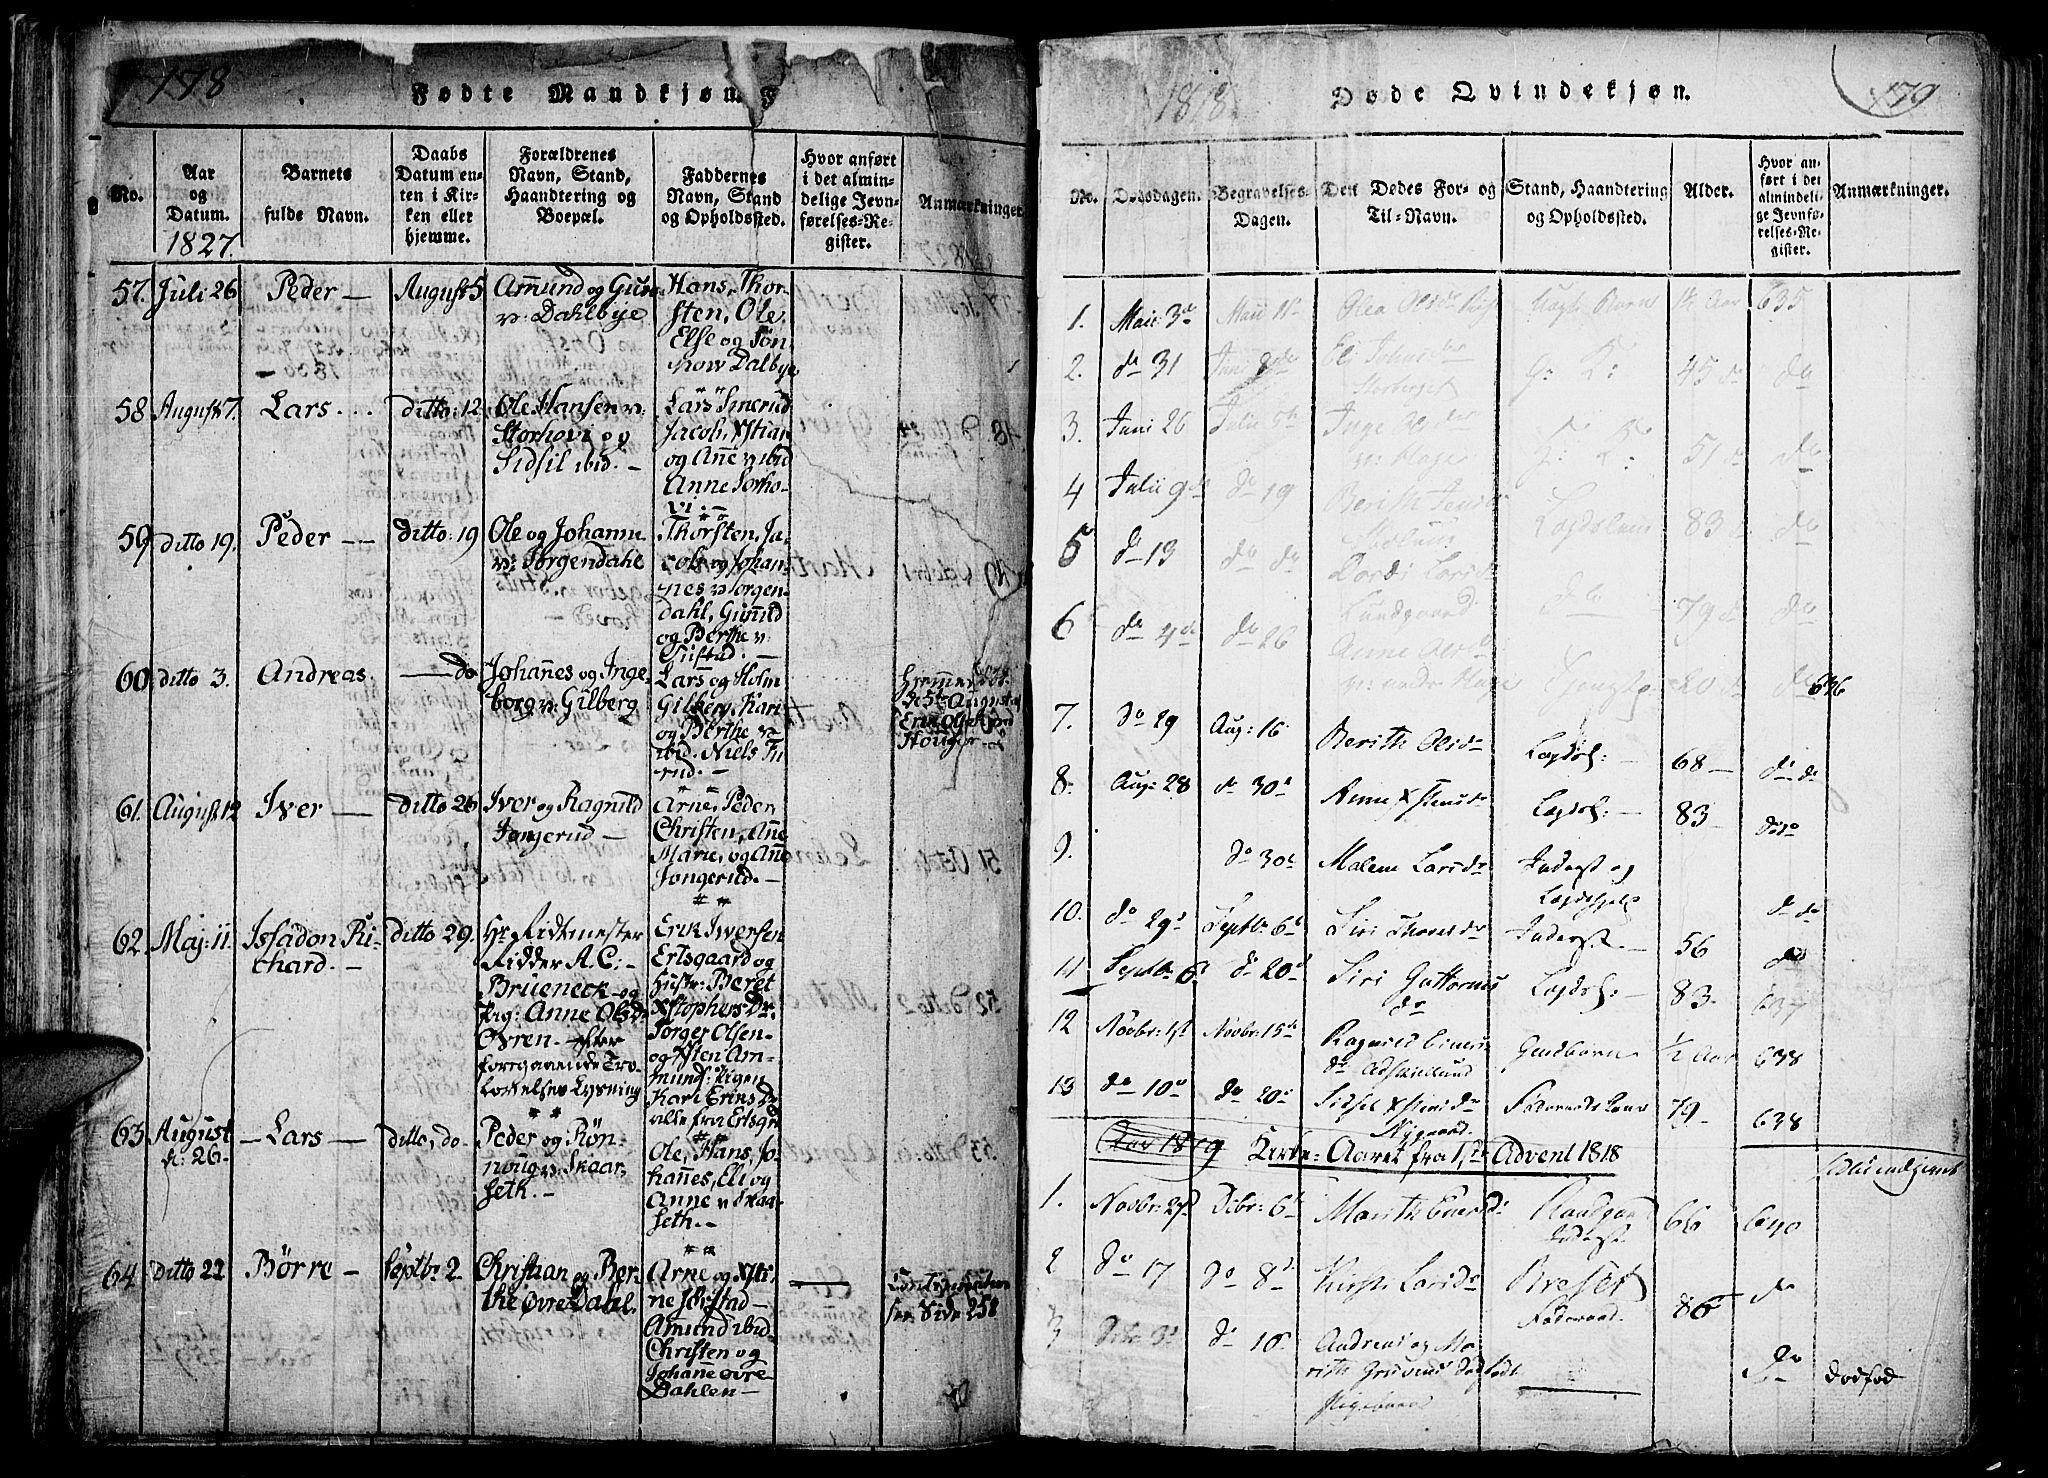 SAH, Fåberg prestekontor, Ministerialbok nr. 3, 1818-1833, s. 178-179